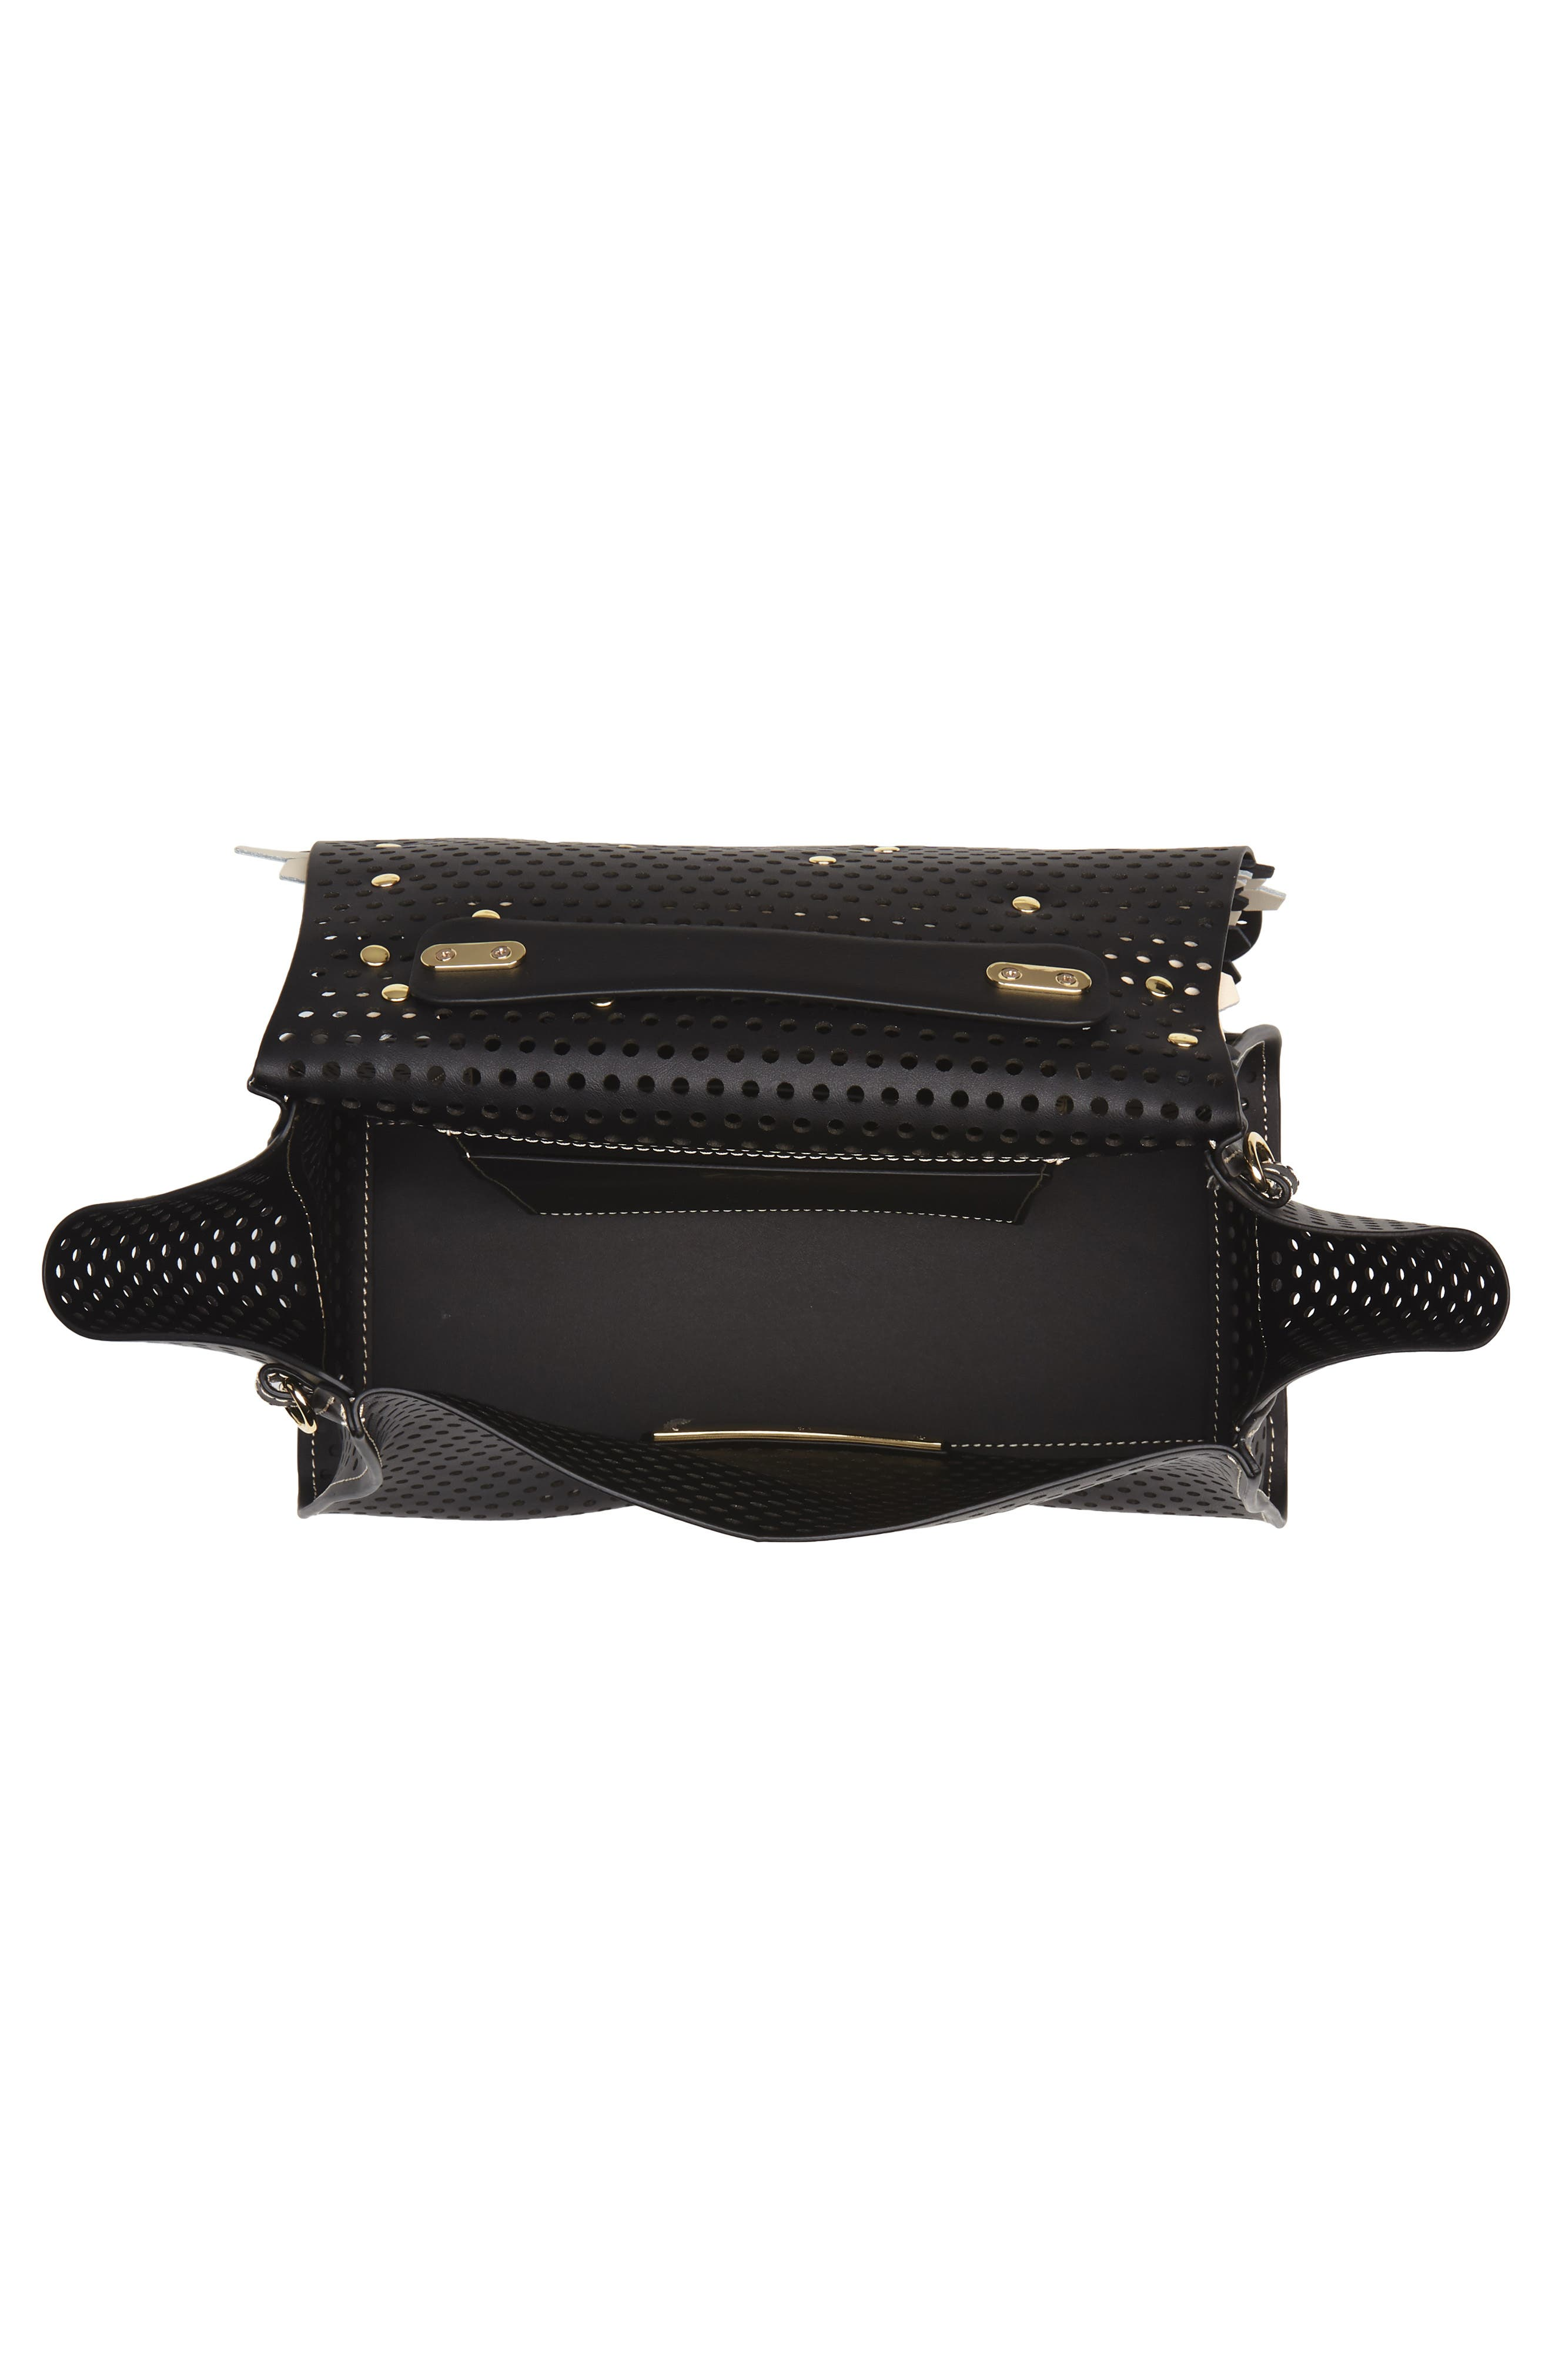 Eartha Kit Calfskin Leather Top Handle Satchel,                             Alternate thumbnail 7, color,